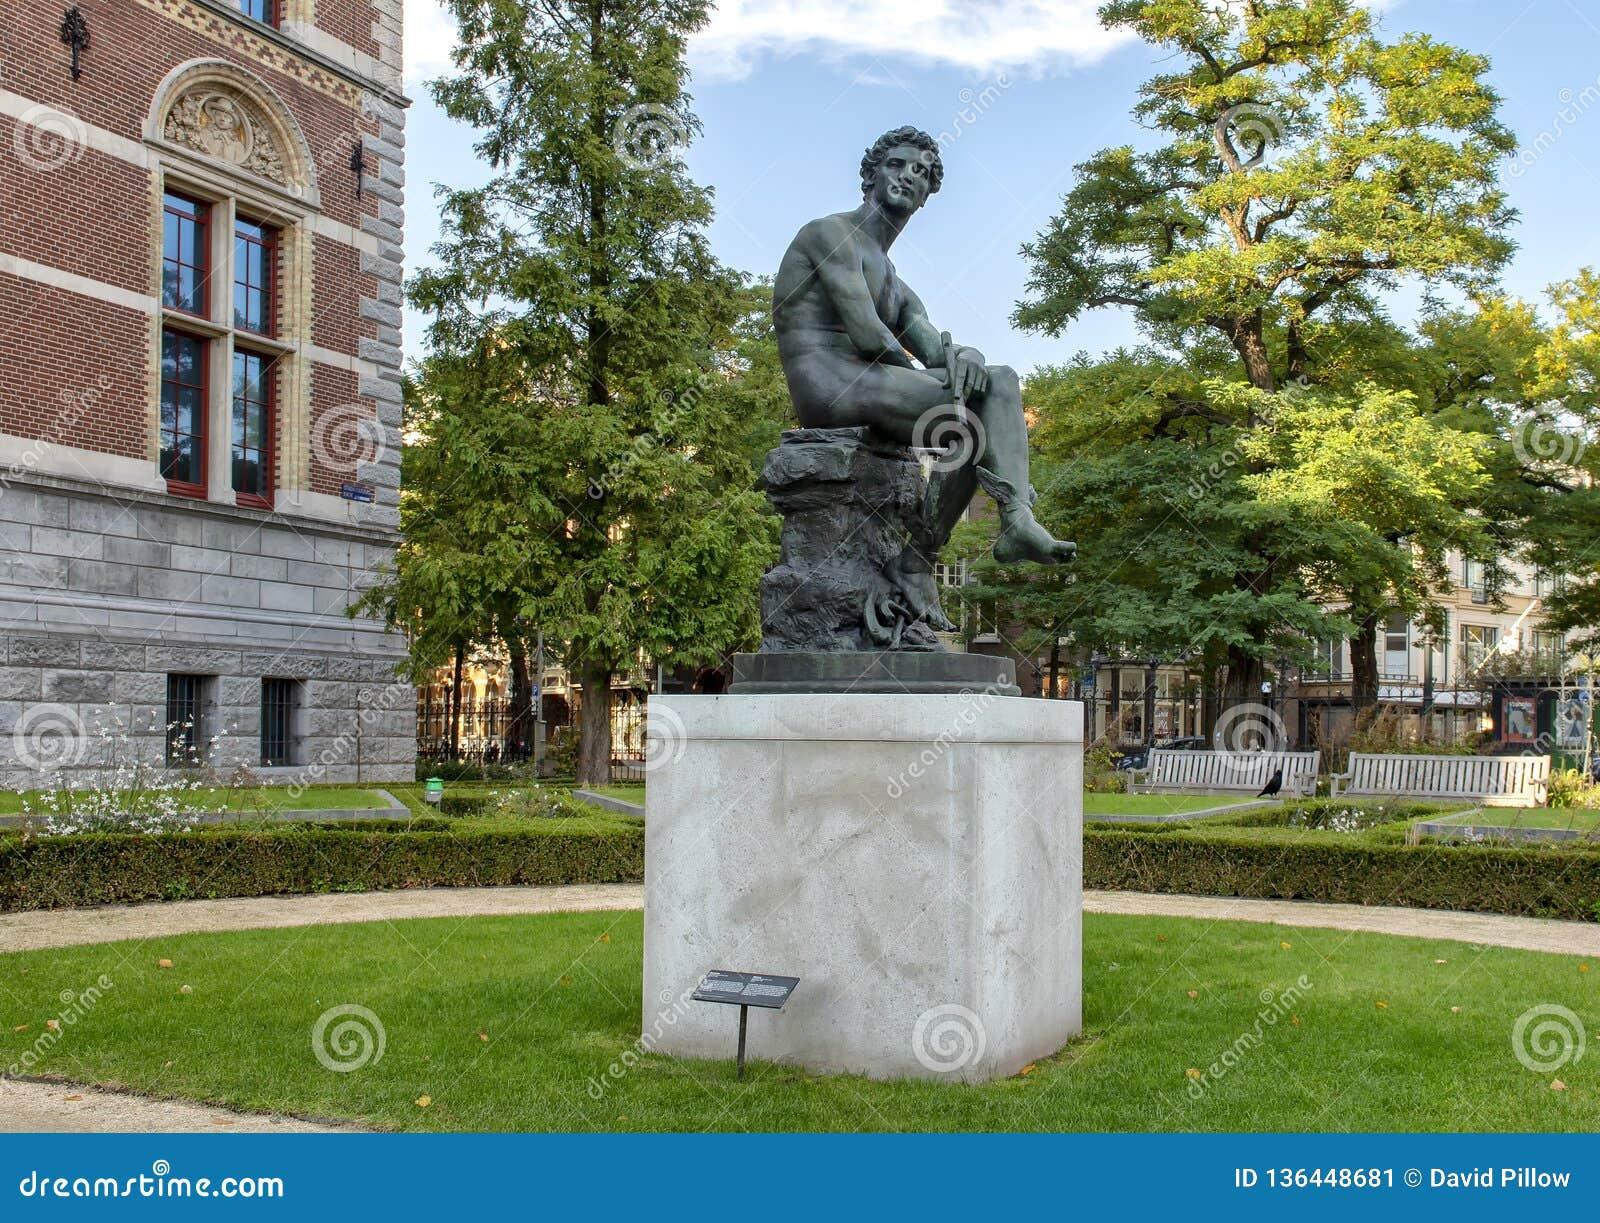 Statue en bronze de Mercury, Rijksmuseum, Amsterdam, Pays-Bas